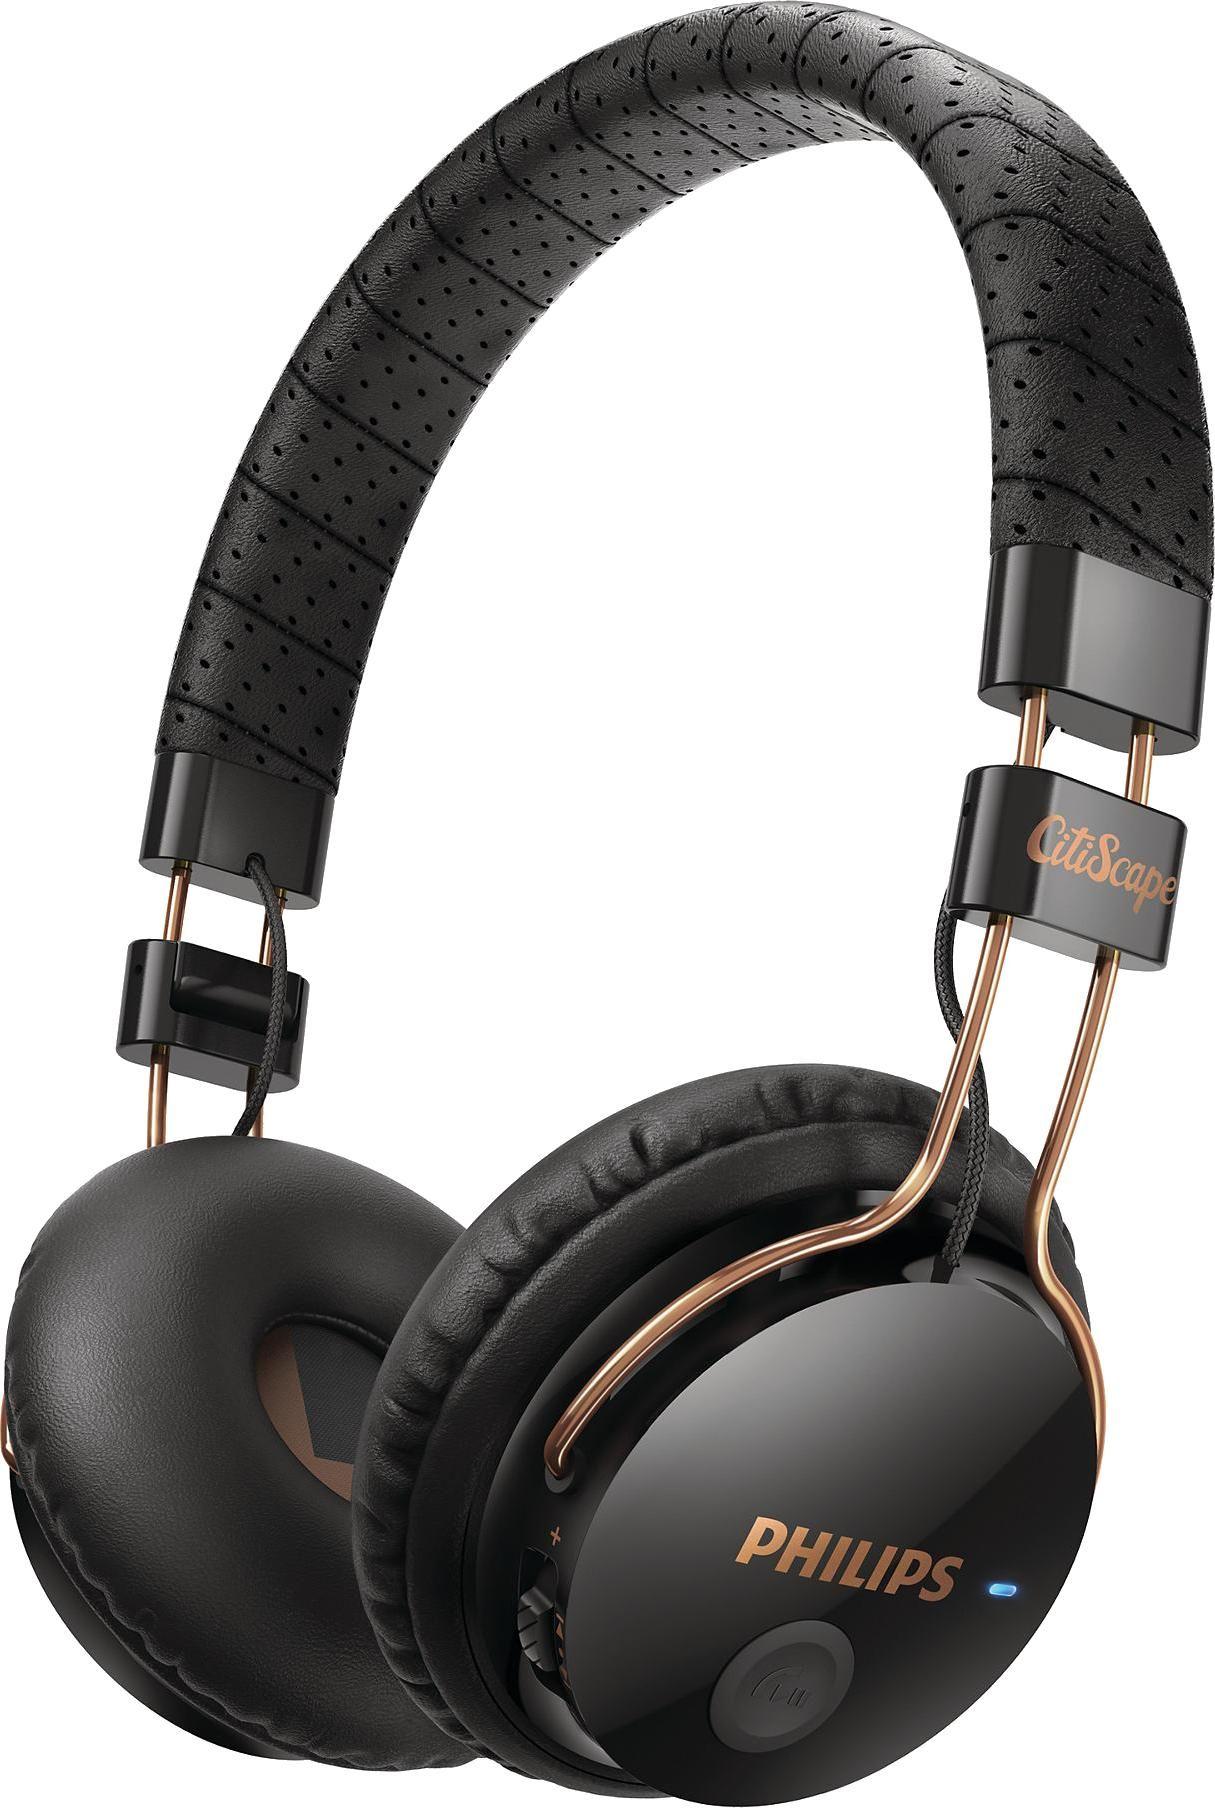 Philips Bluetooth Headphones Headphones Bluetooth Headphones Headset